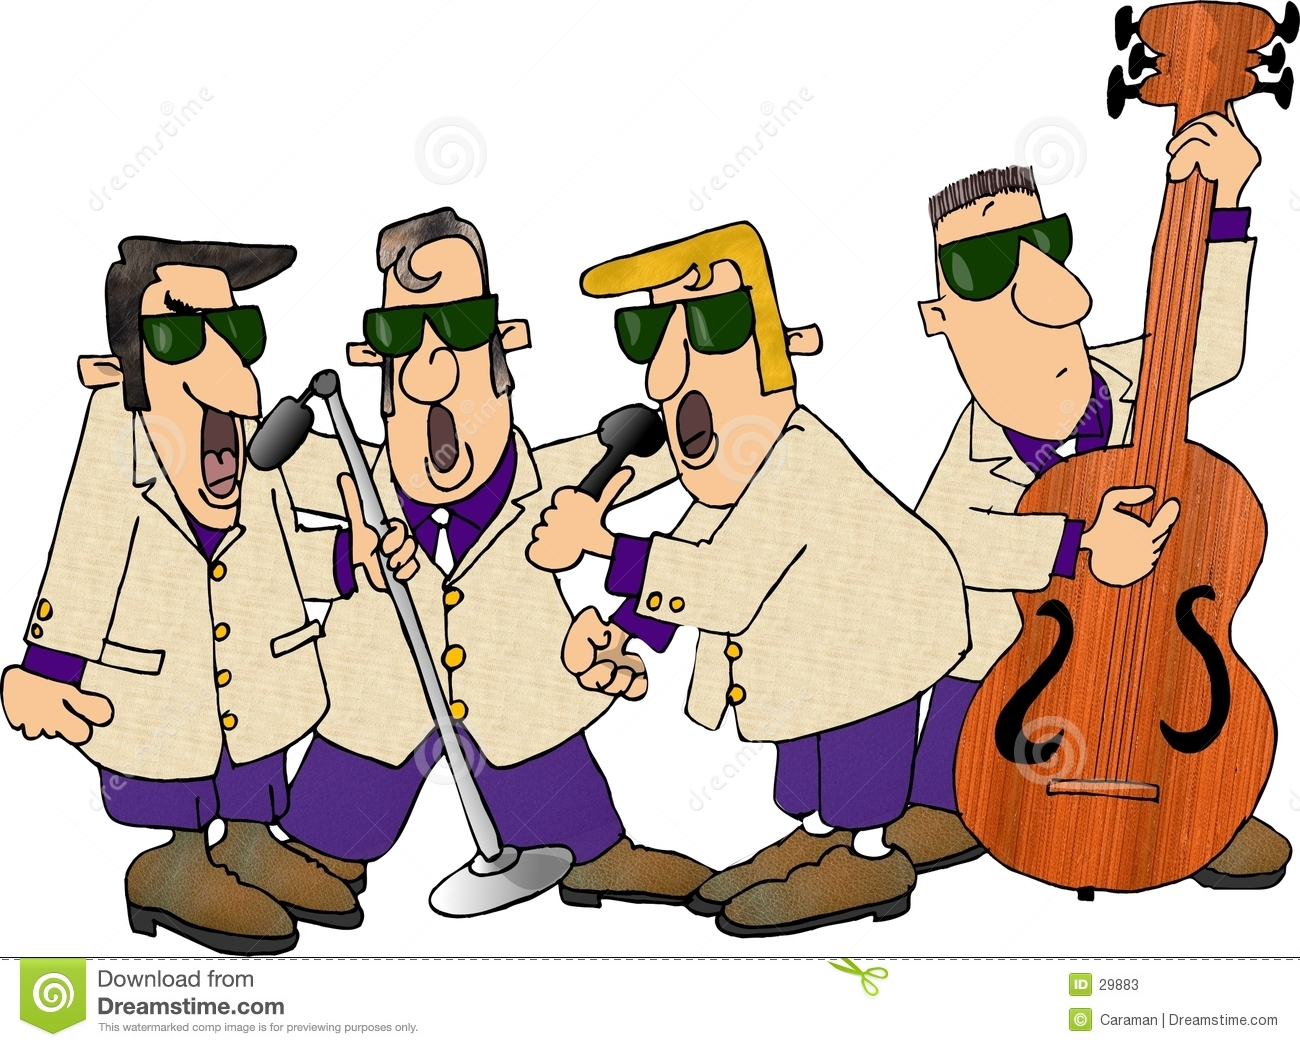 free cartoon rock band clipart - photo #15